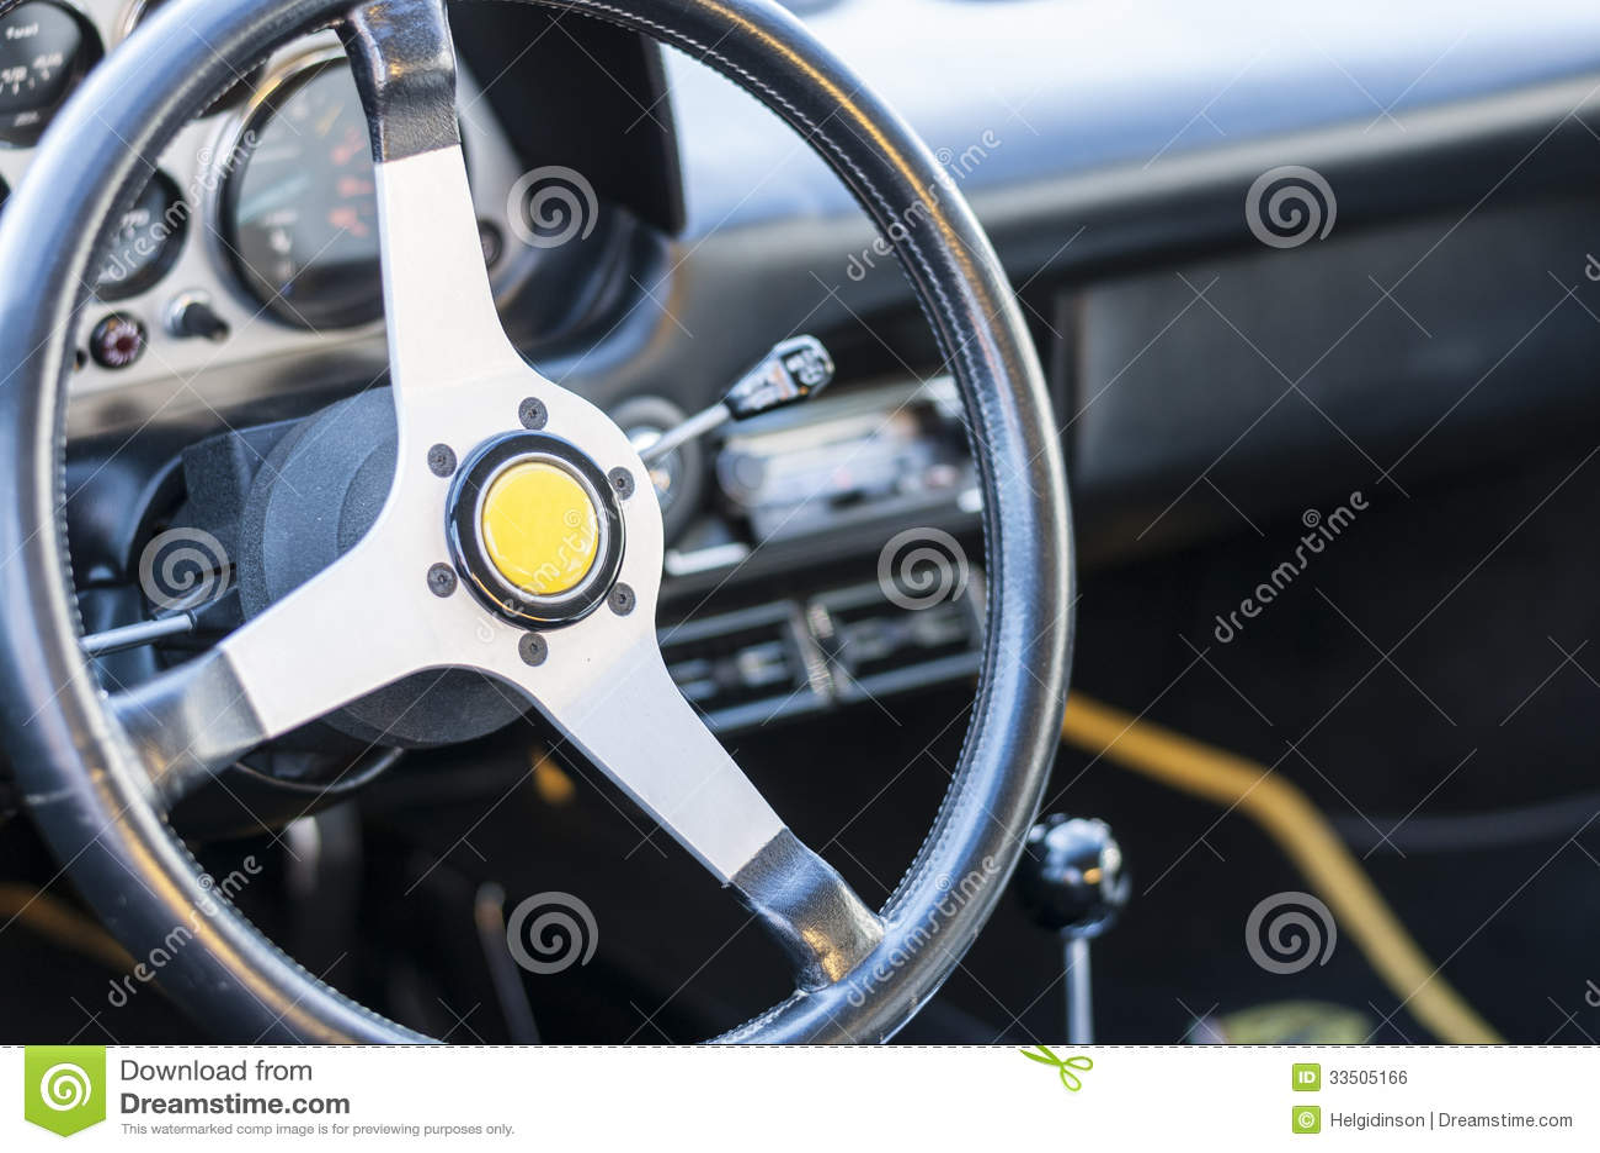 volant de voiture de sport photo stock image du airbag 33505166. Black Bedroom Furniture Sets. Home Design Ideas